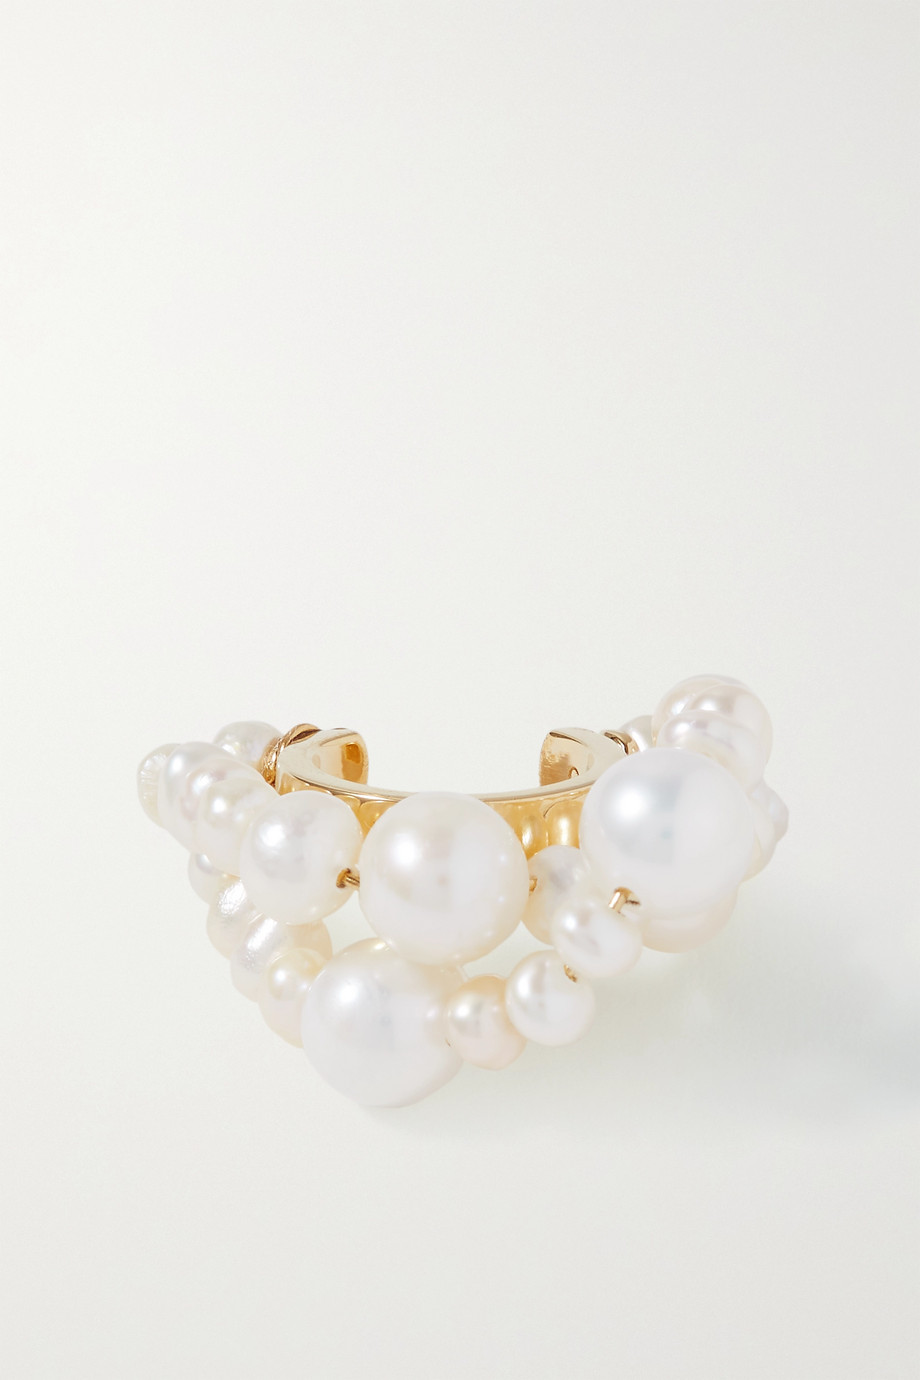 Completedworks Bijou d'oreille en vermeil et perles Cumulus